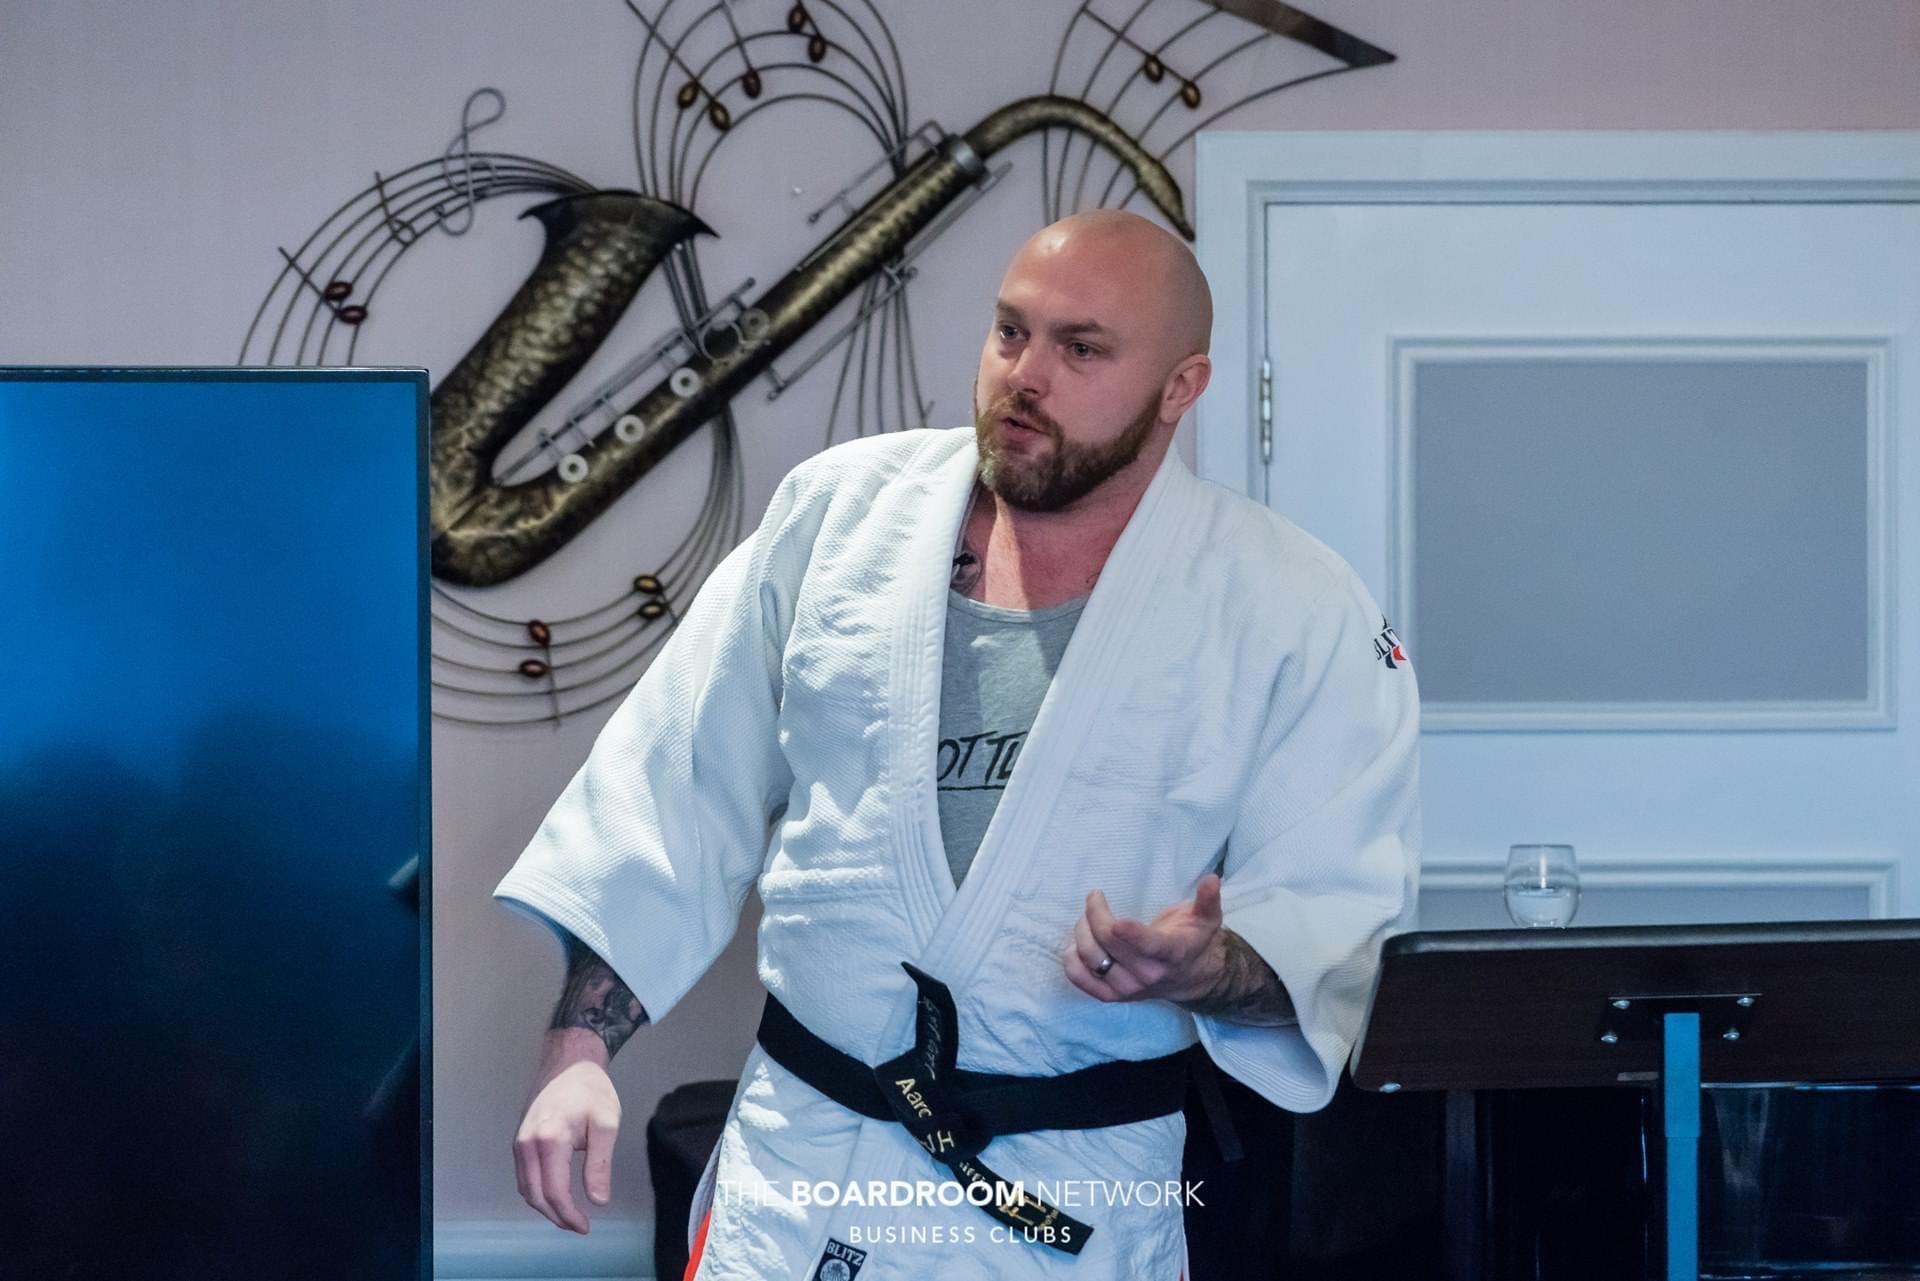 Judo presentation at The Boardroom Network